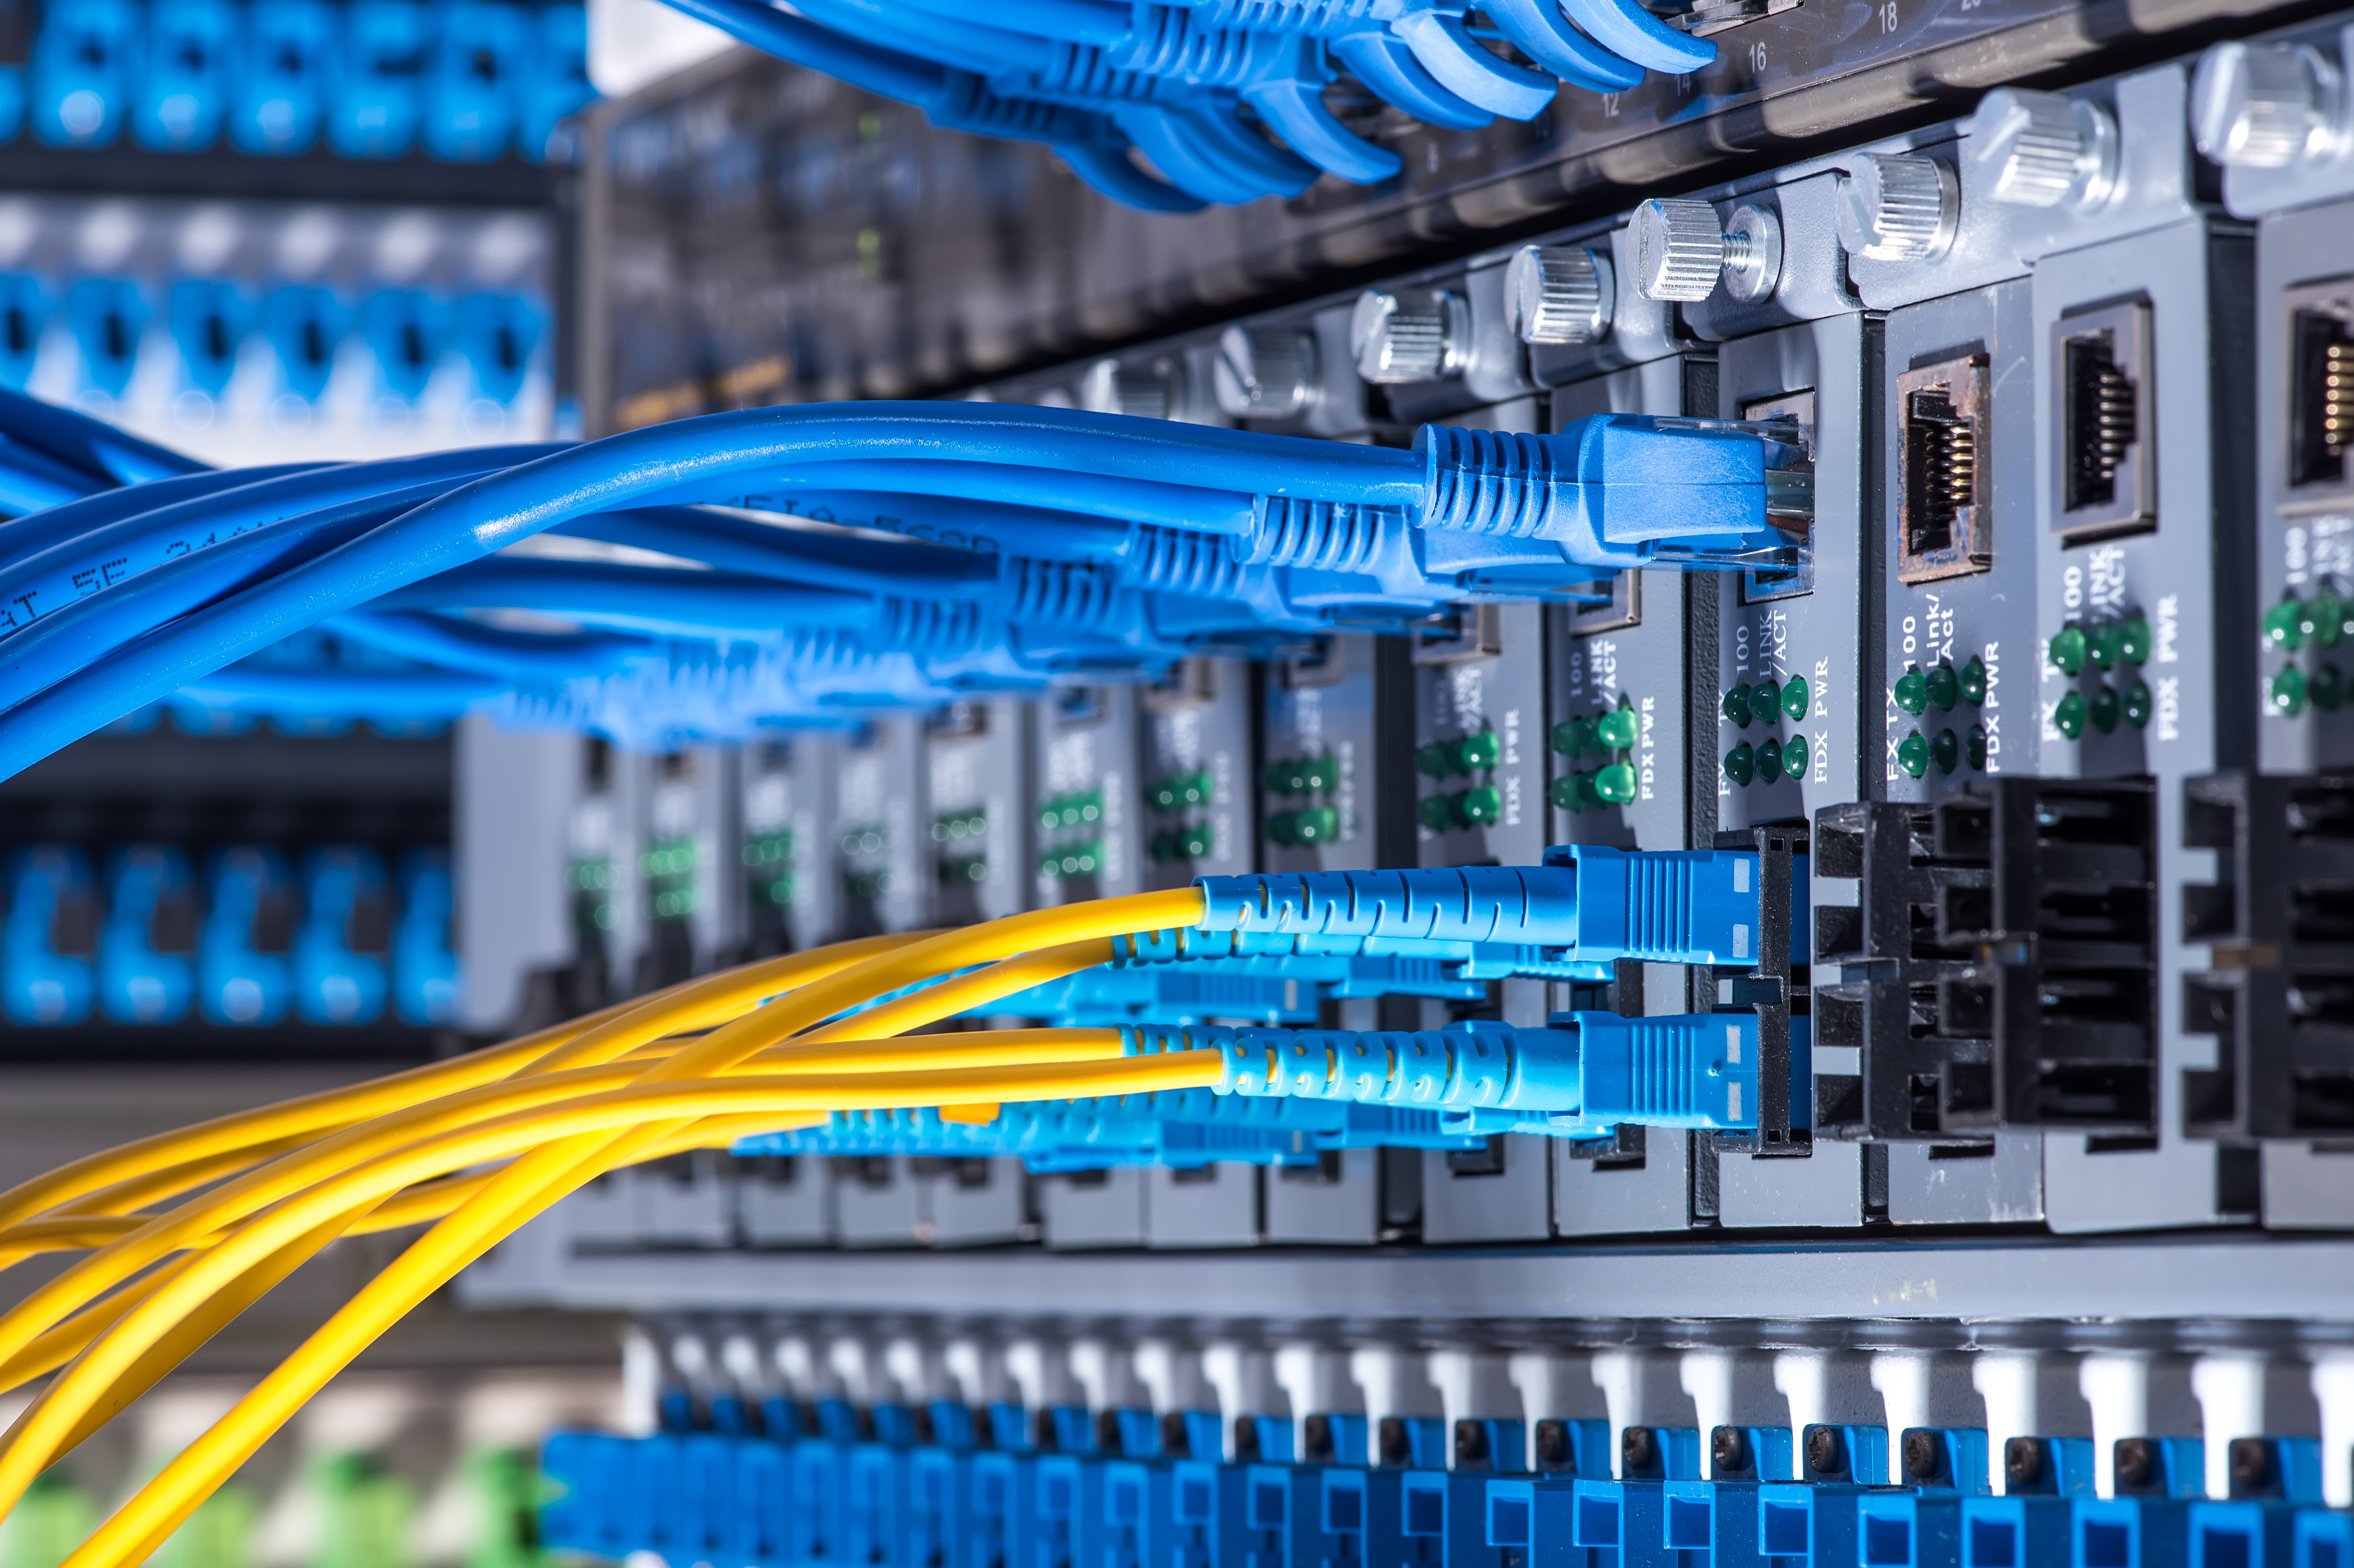 U.S. Senate Votes To Repeal Obama-Era Internet Privacy Rules